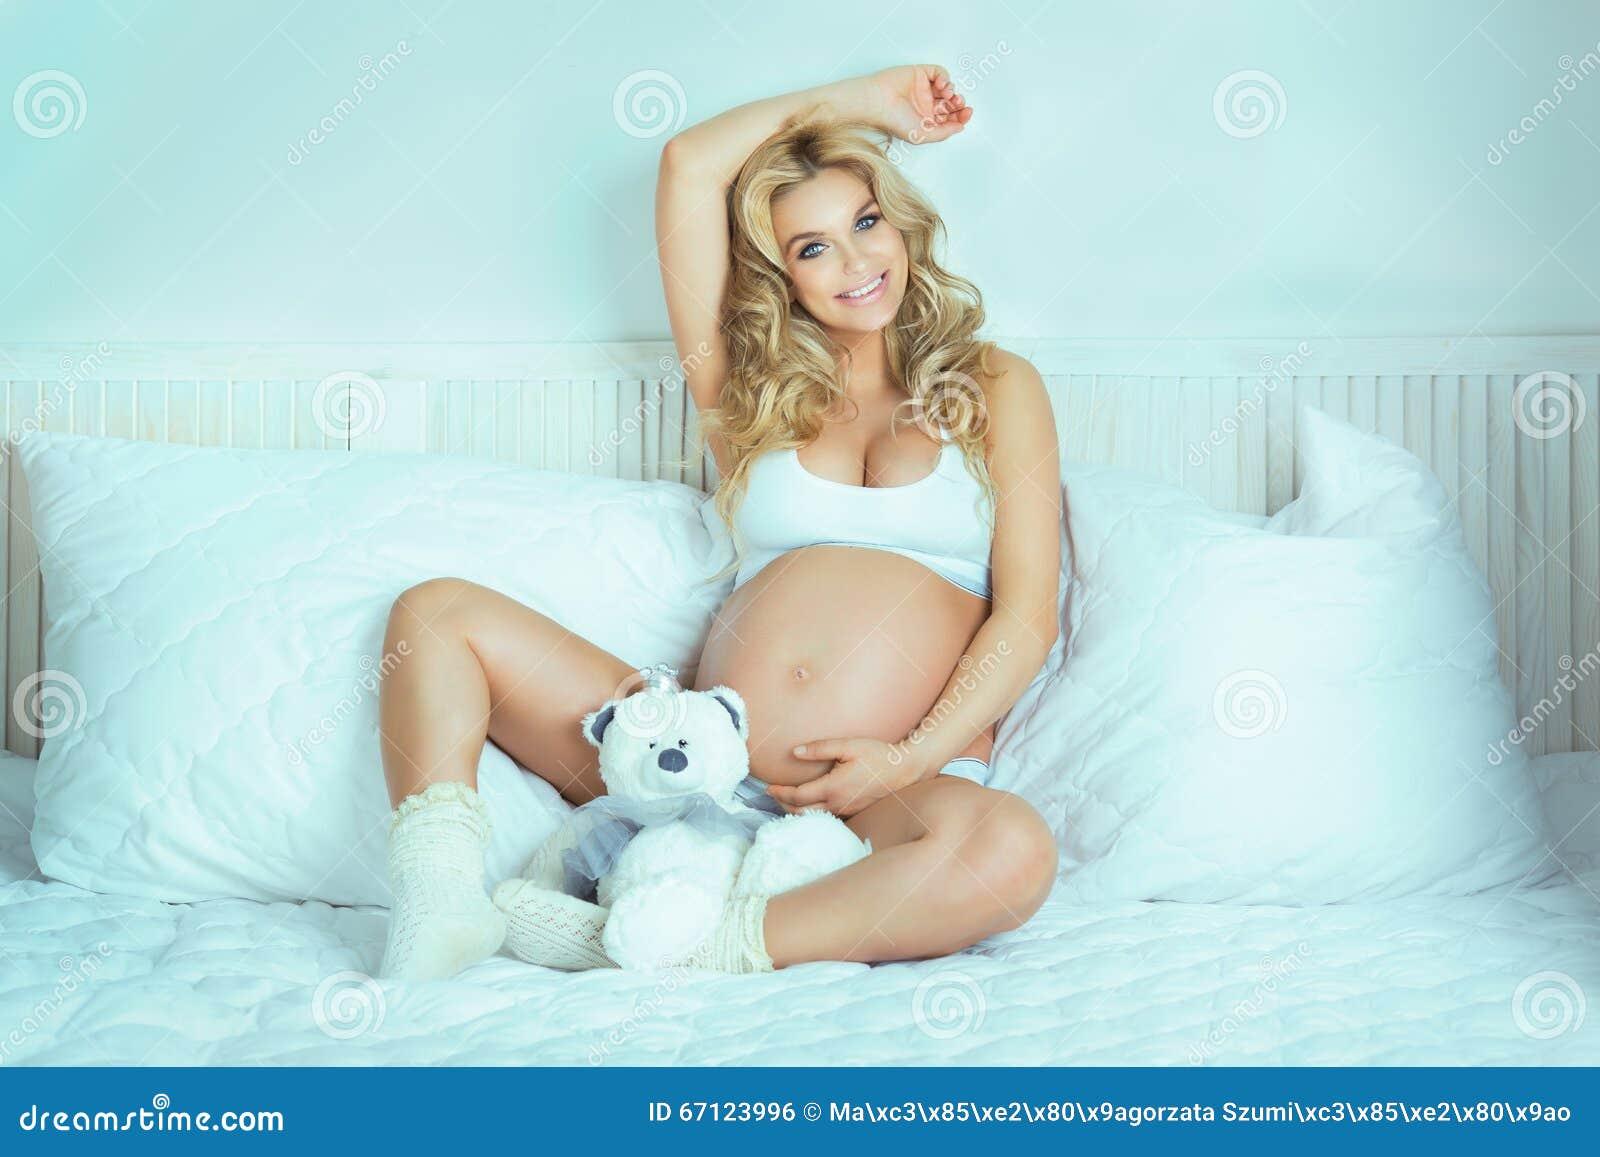 Sexy beautiful pregnant woman